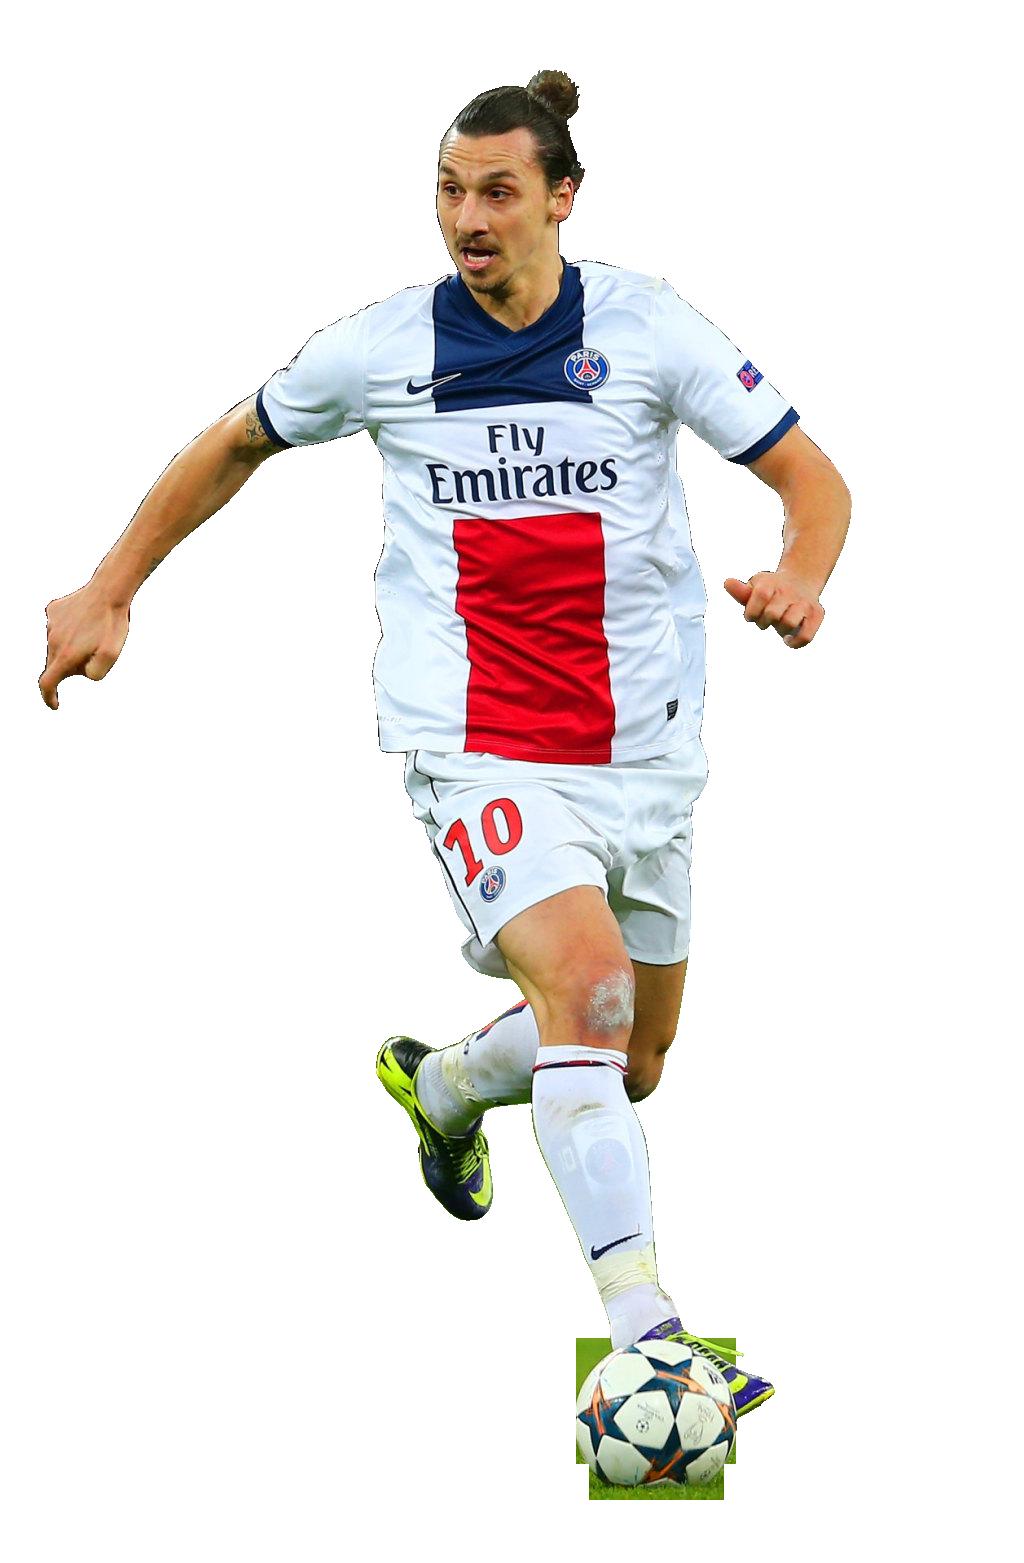 Zlatan Ibrahimovic Clipart image #41068